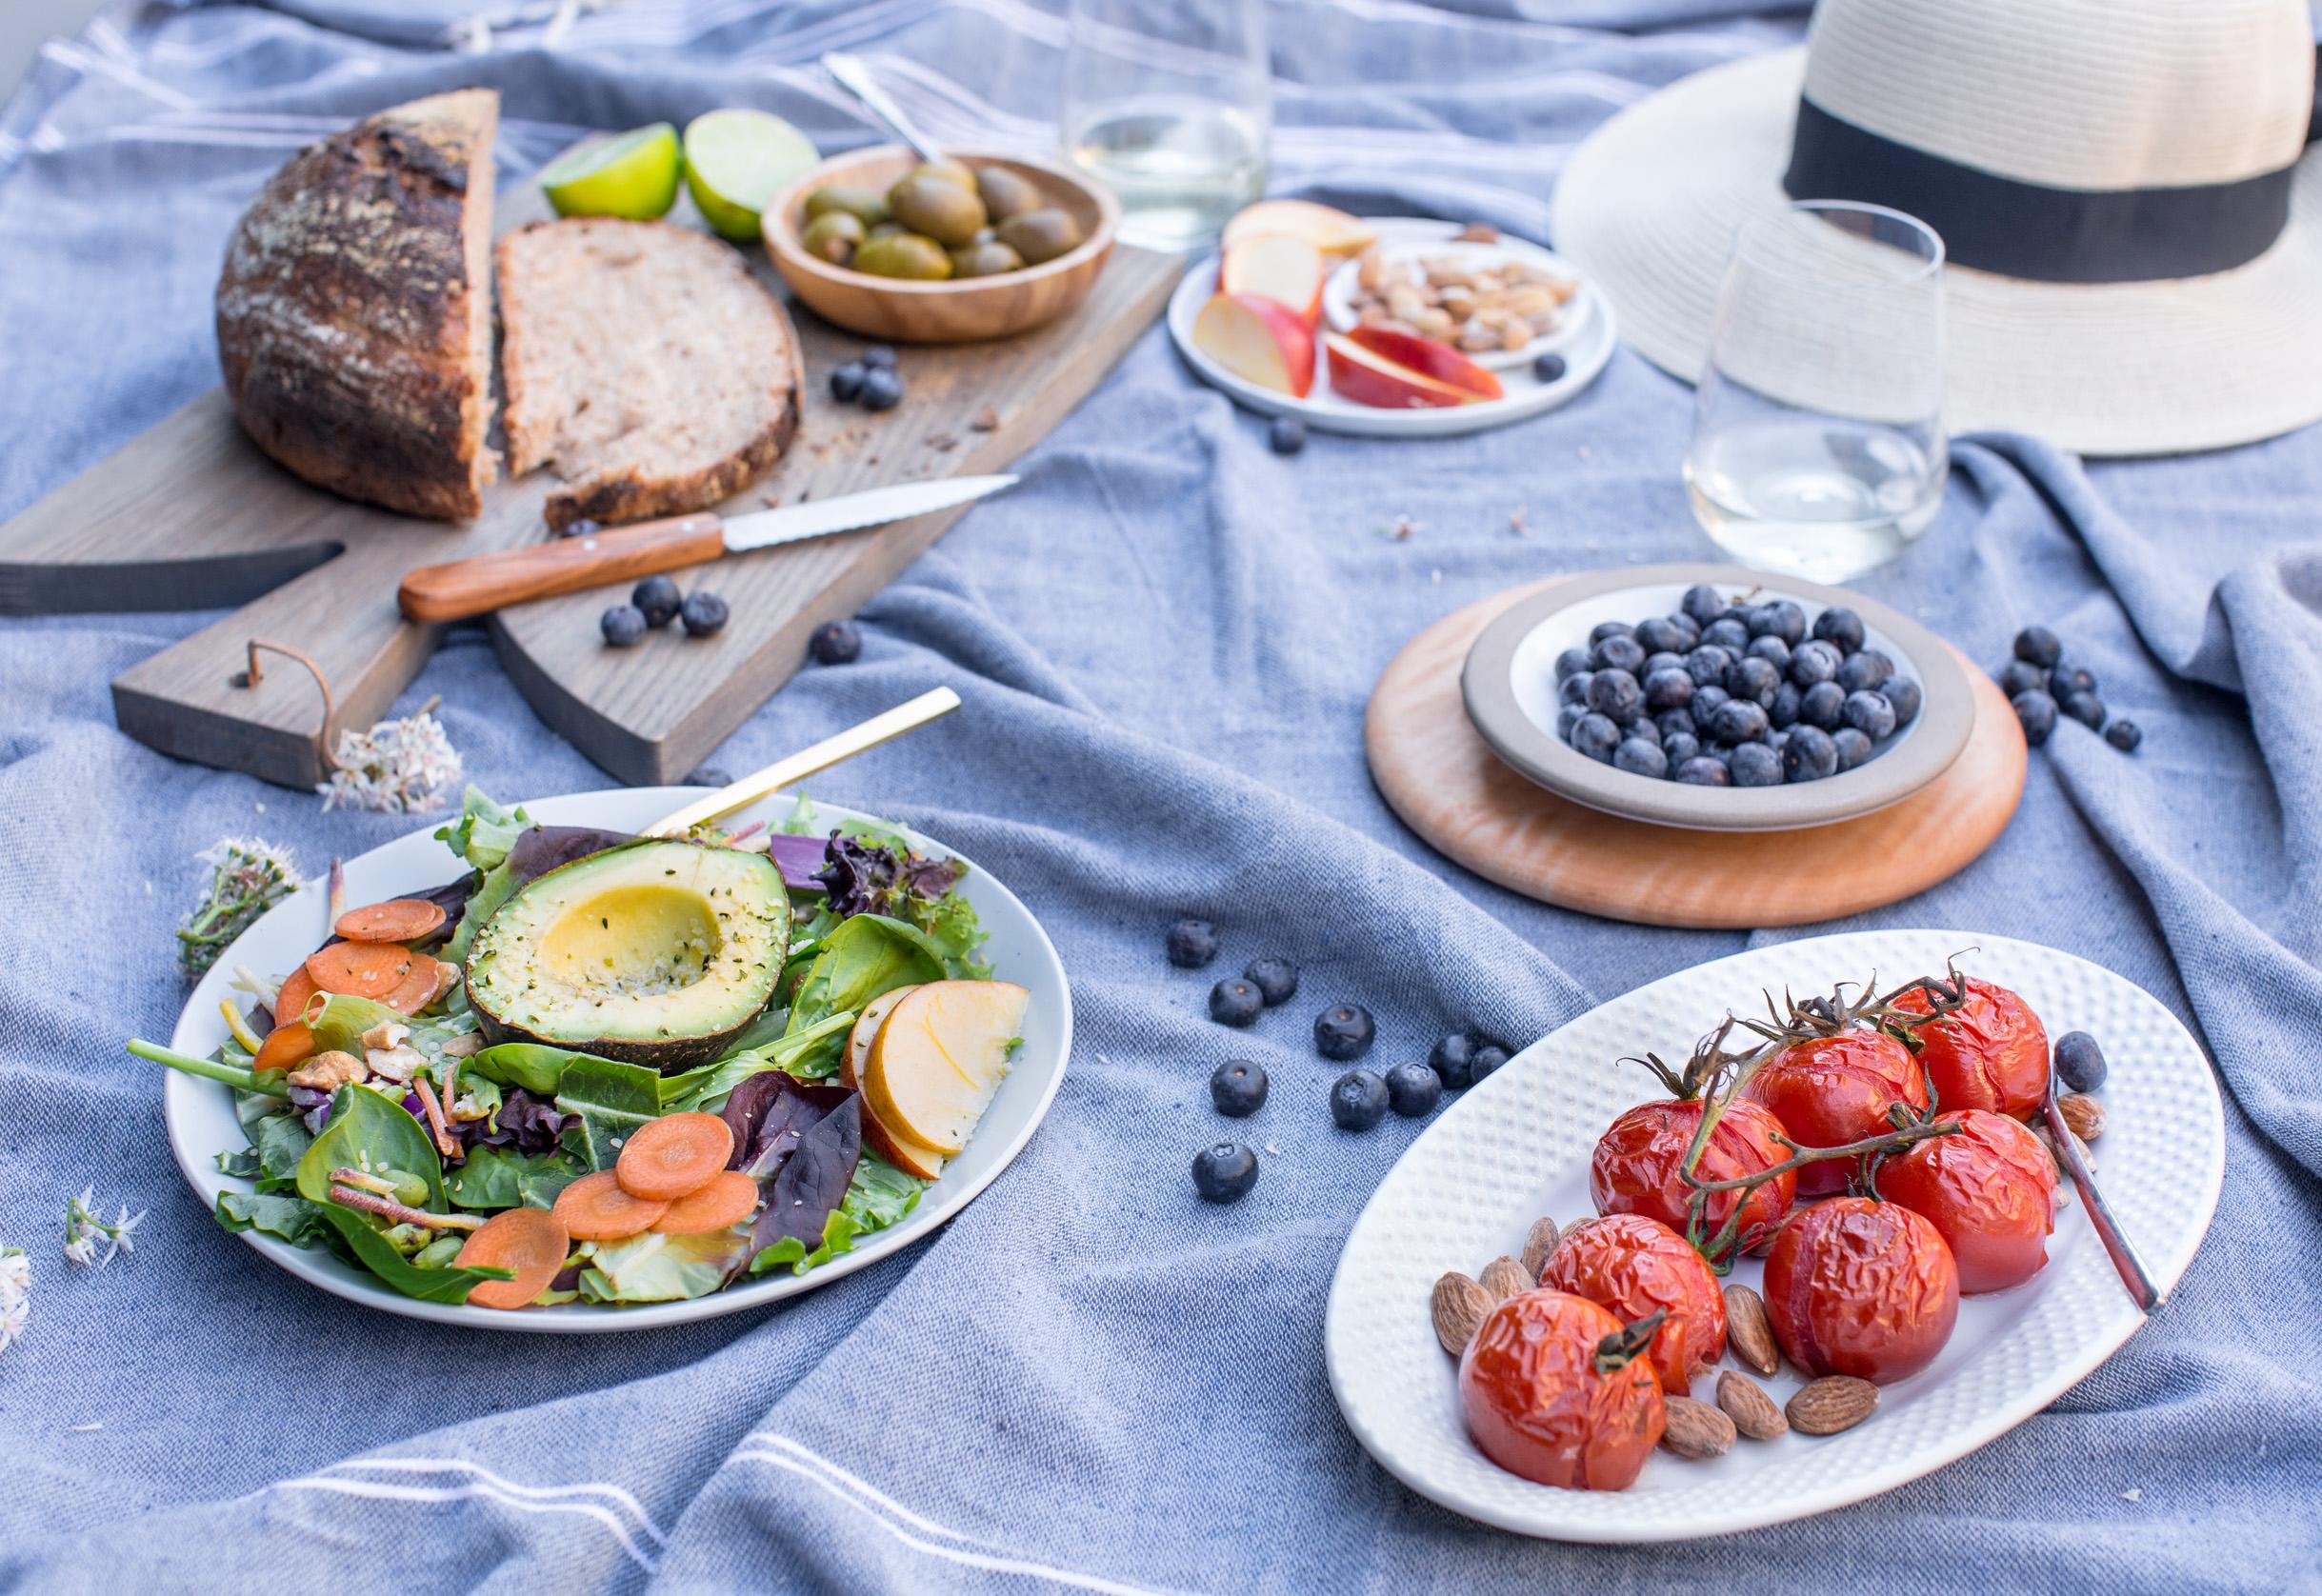 5-Taylor-Farms-Chef-Salad | www.mariereginato.com.jpg